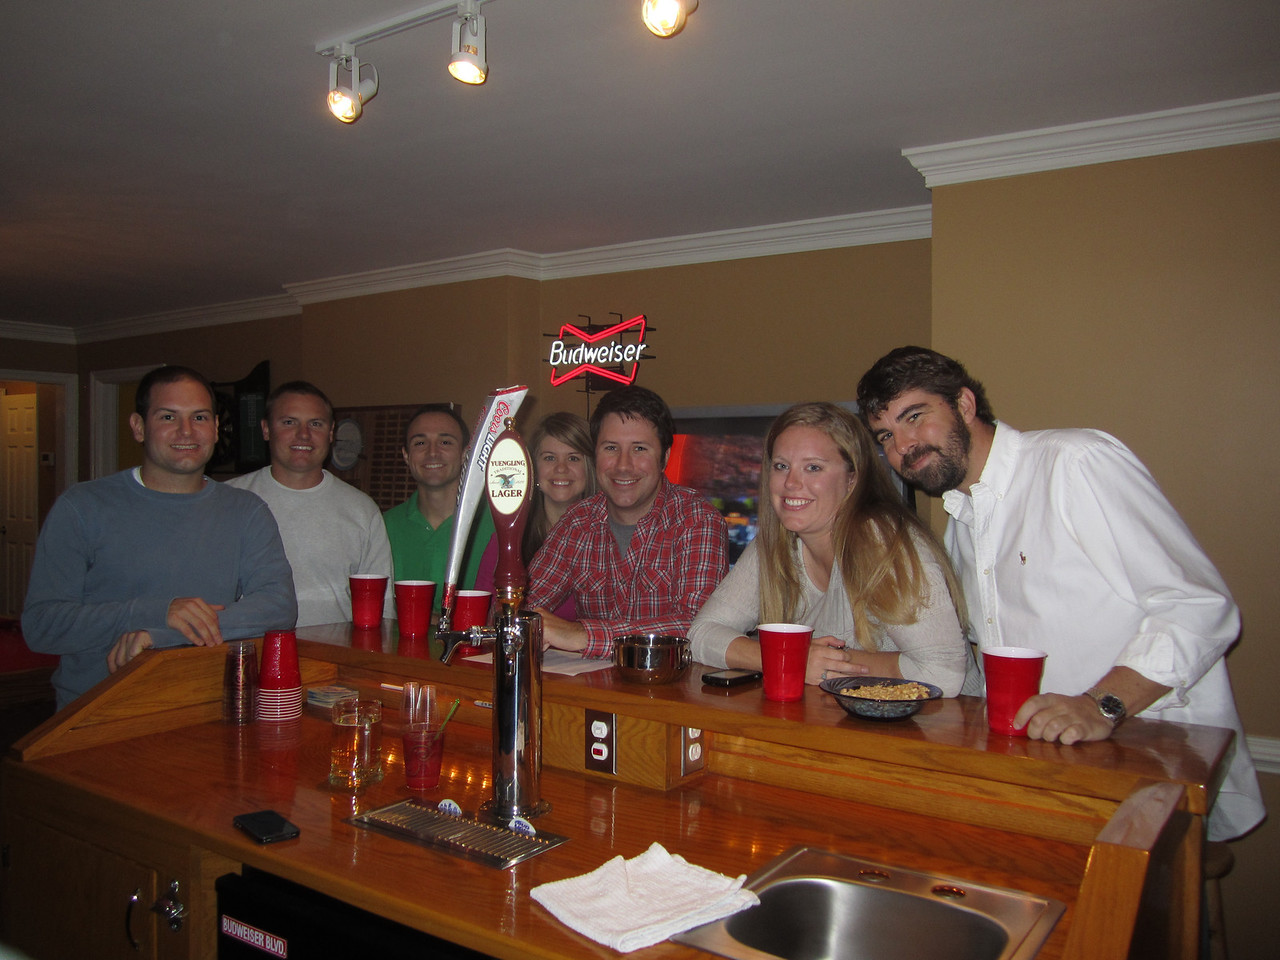 Jon, JG, Chris, Jen, Preston, Lauren and Jay at the bar